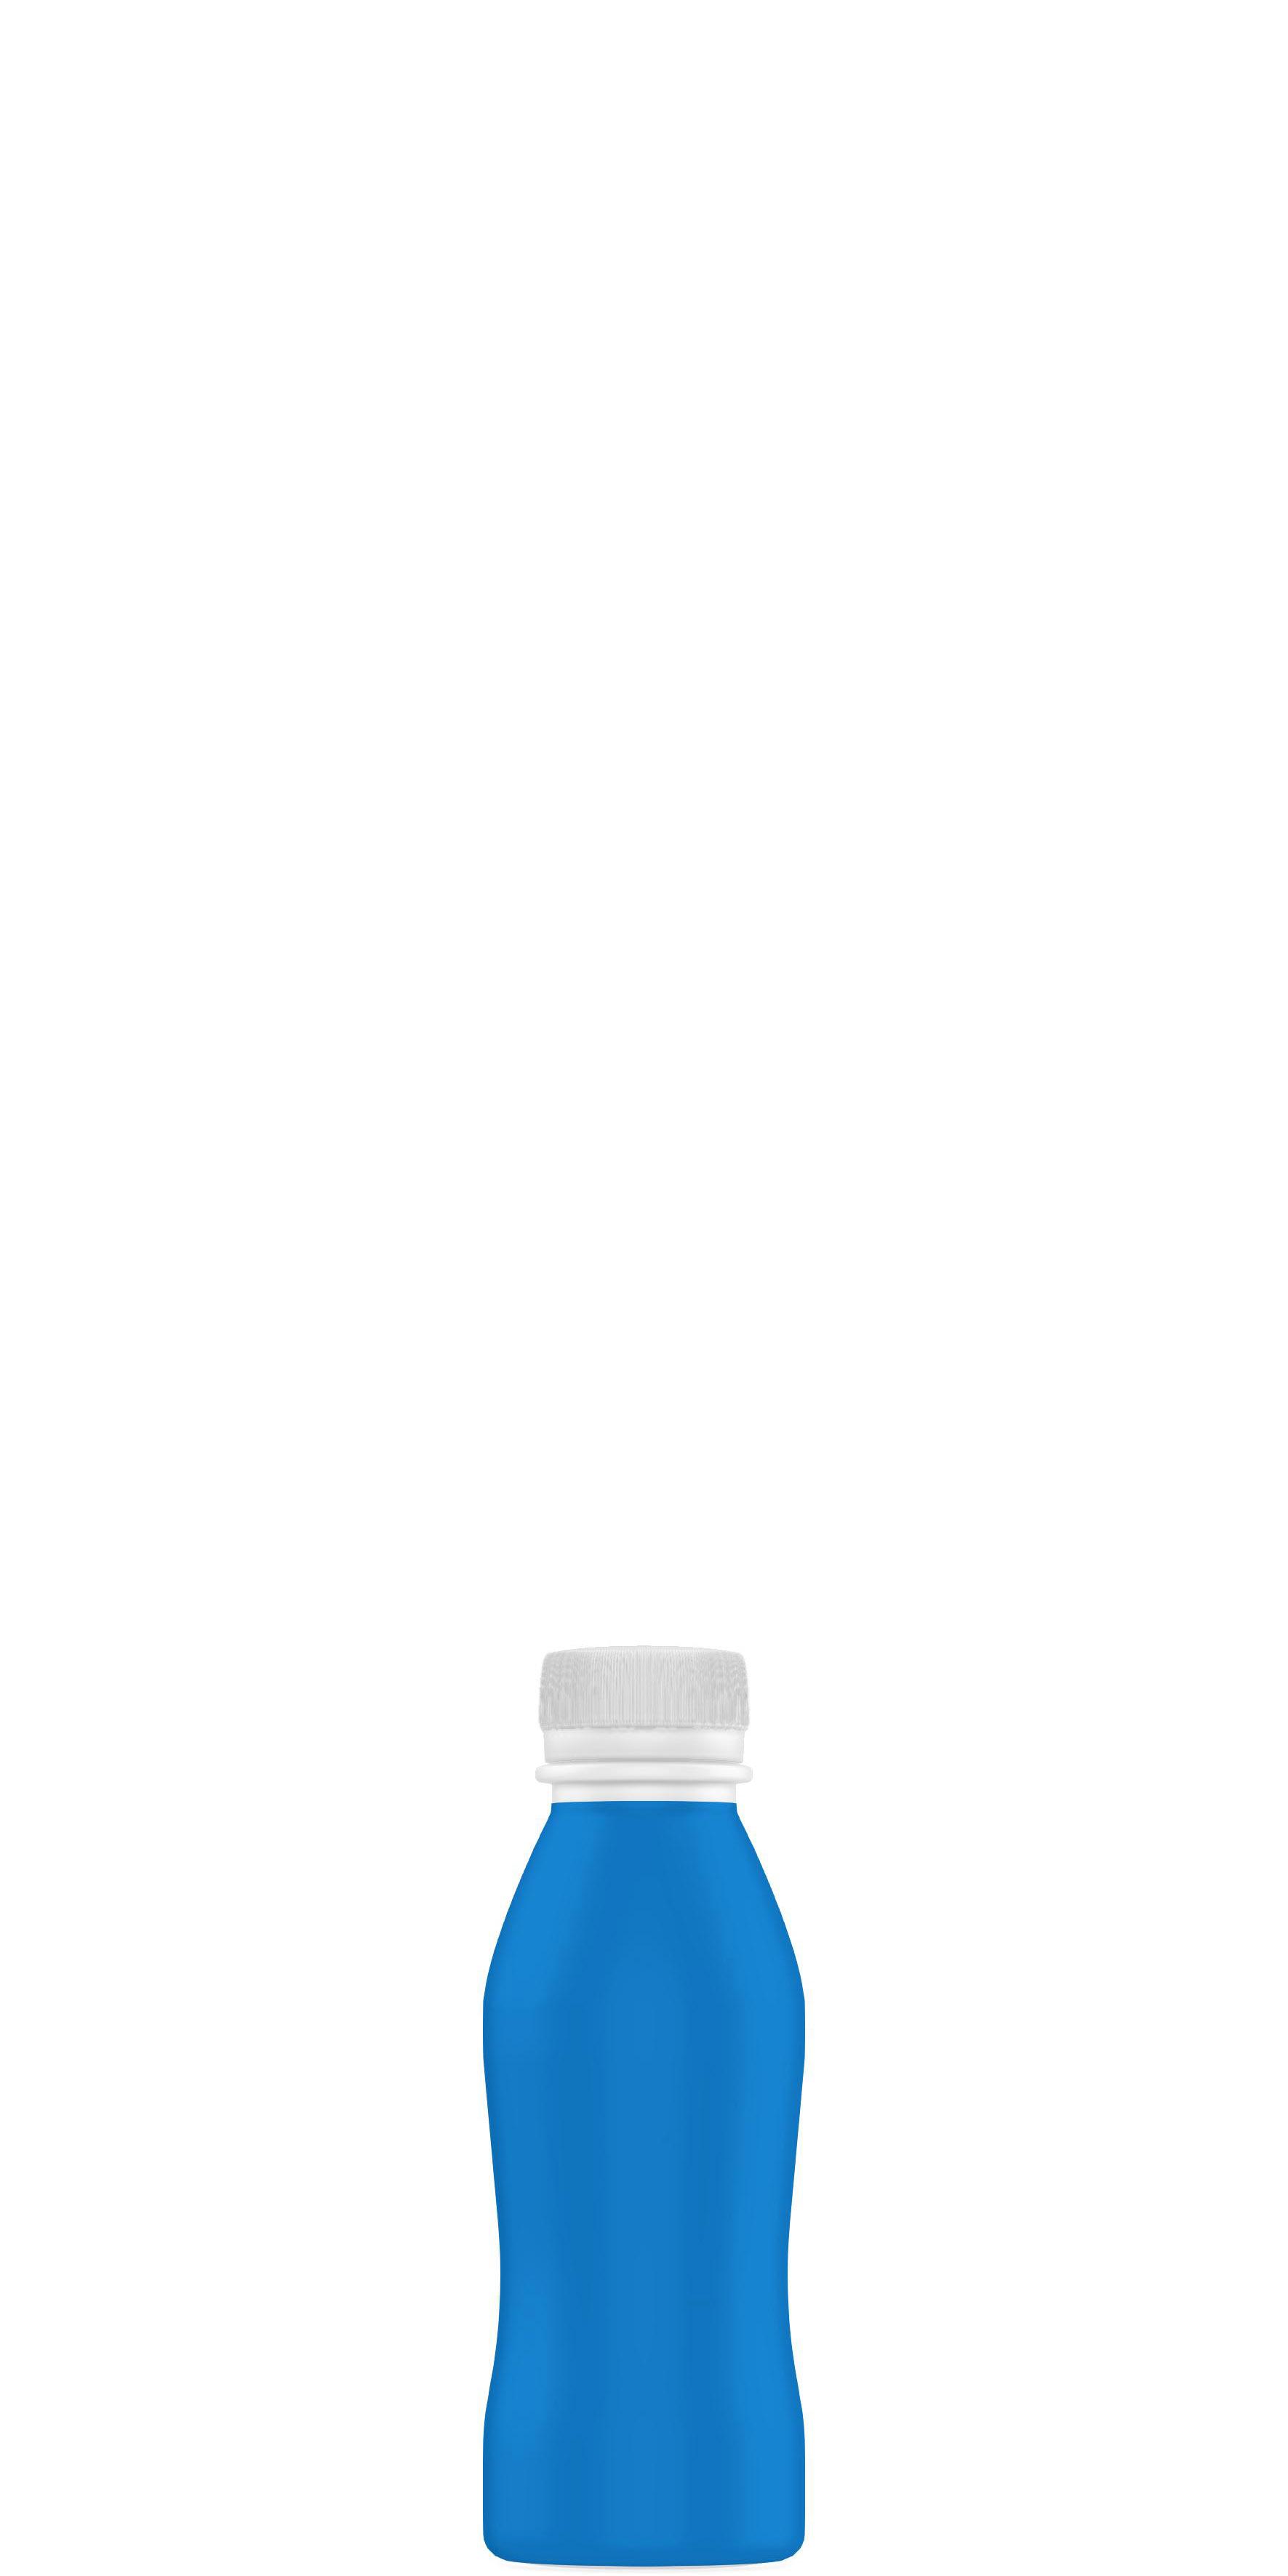 Packaging shape of functional yogurt 10 to 20cl